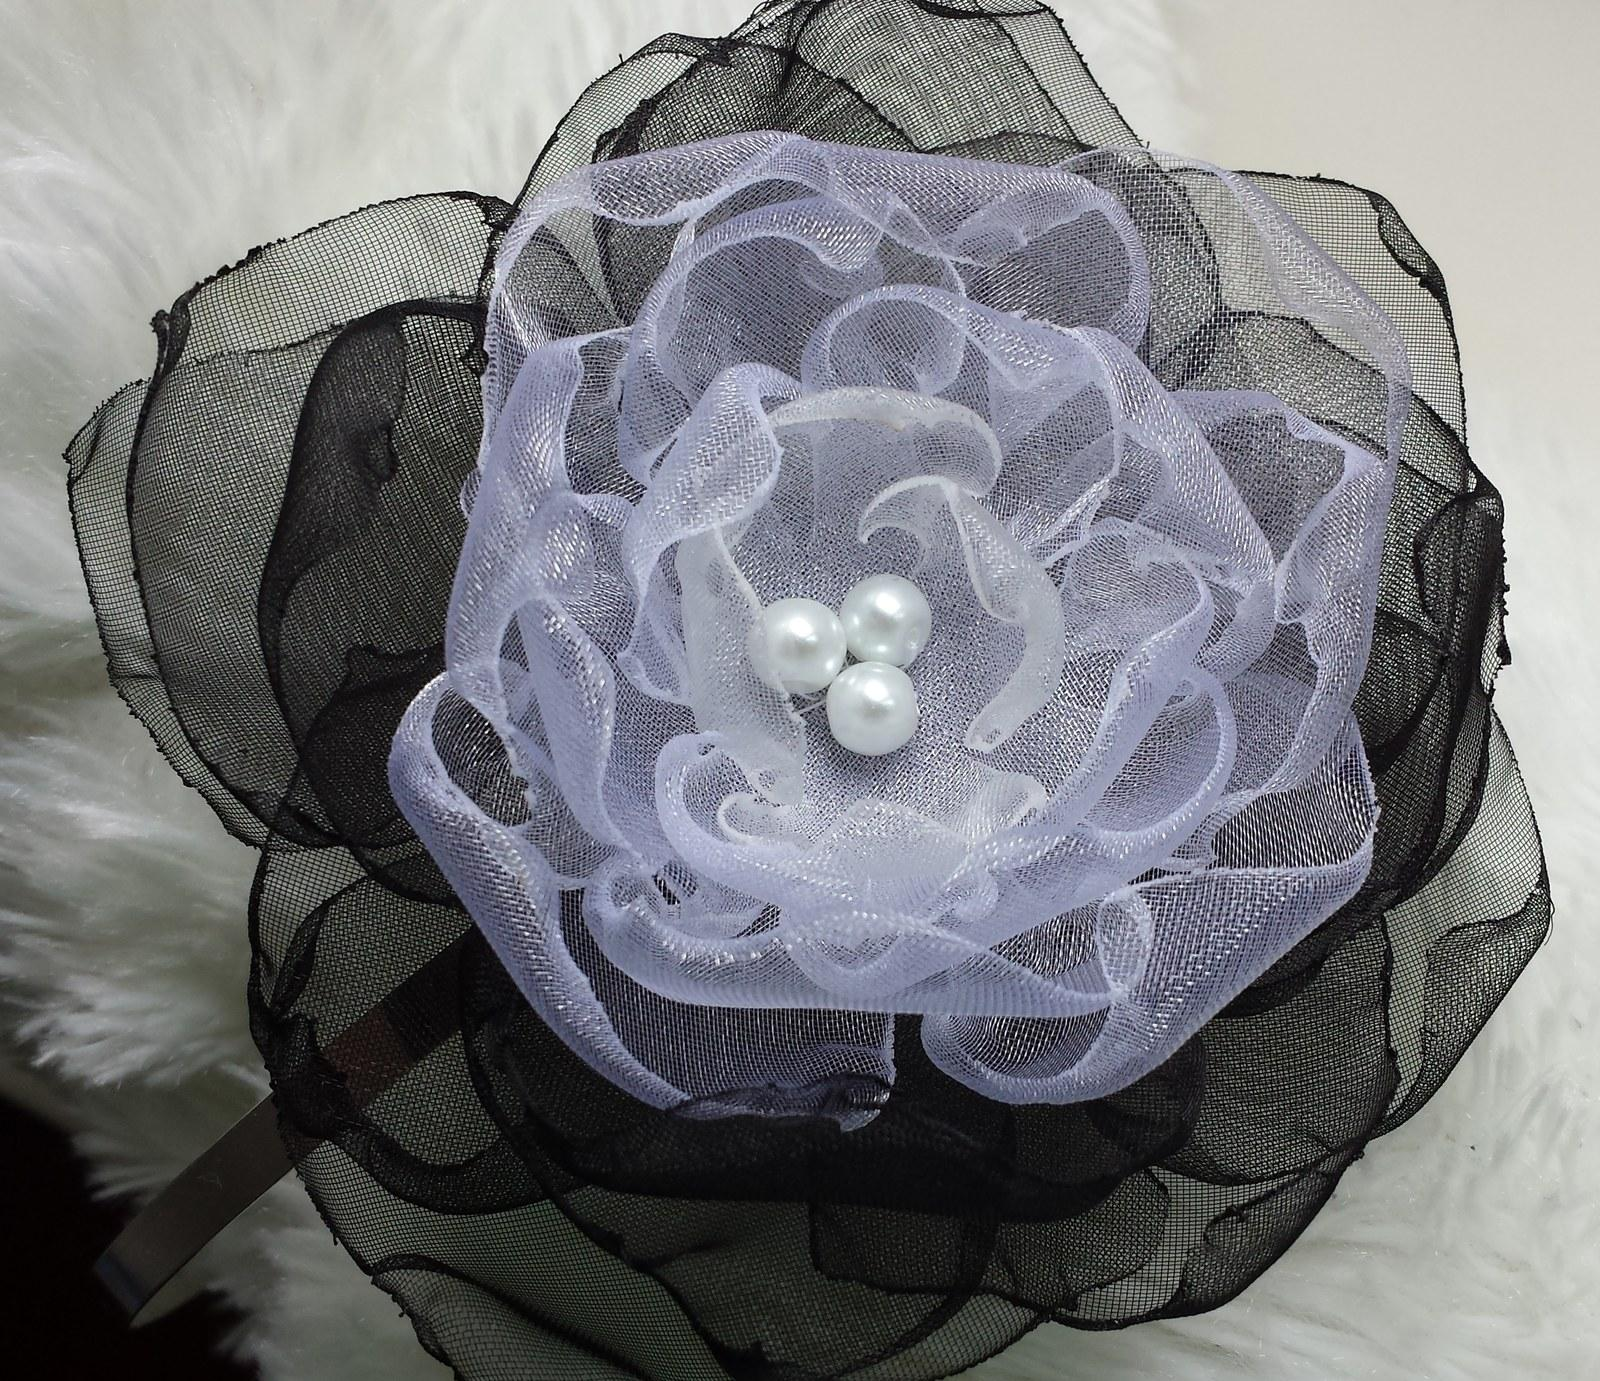 Black & White čelenka - Obrázek č. 1